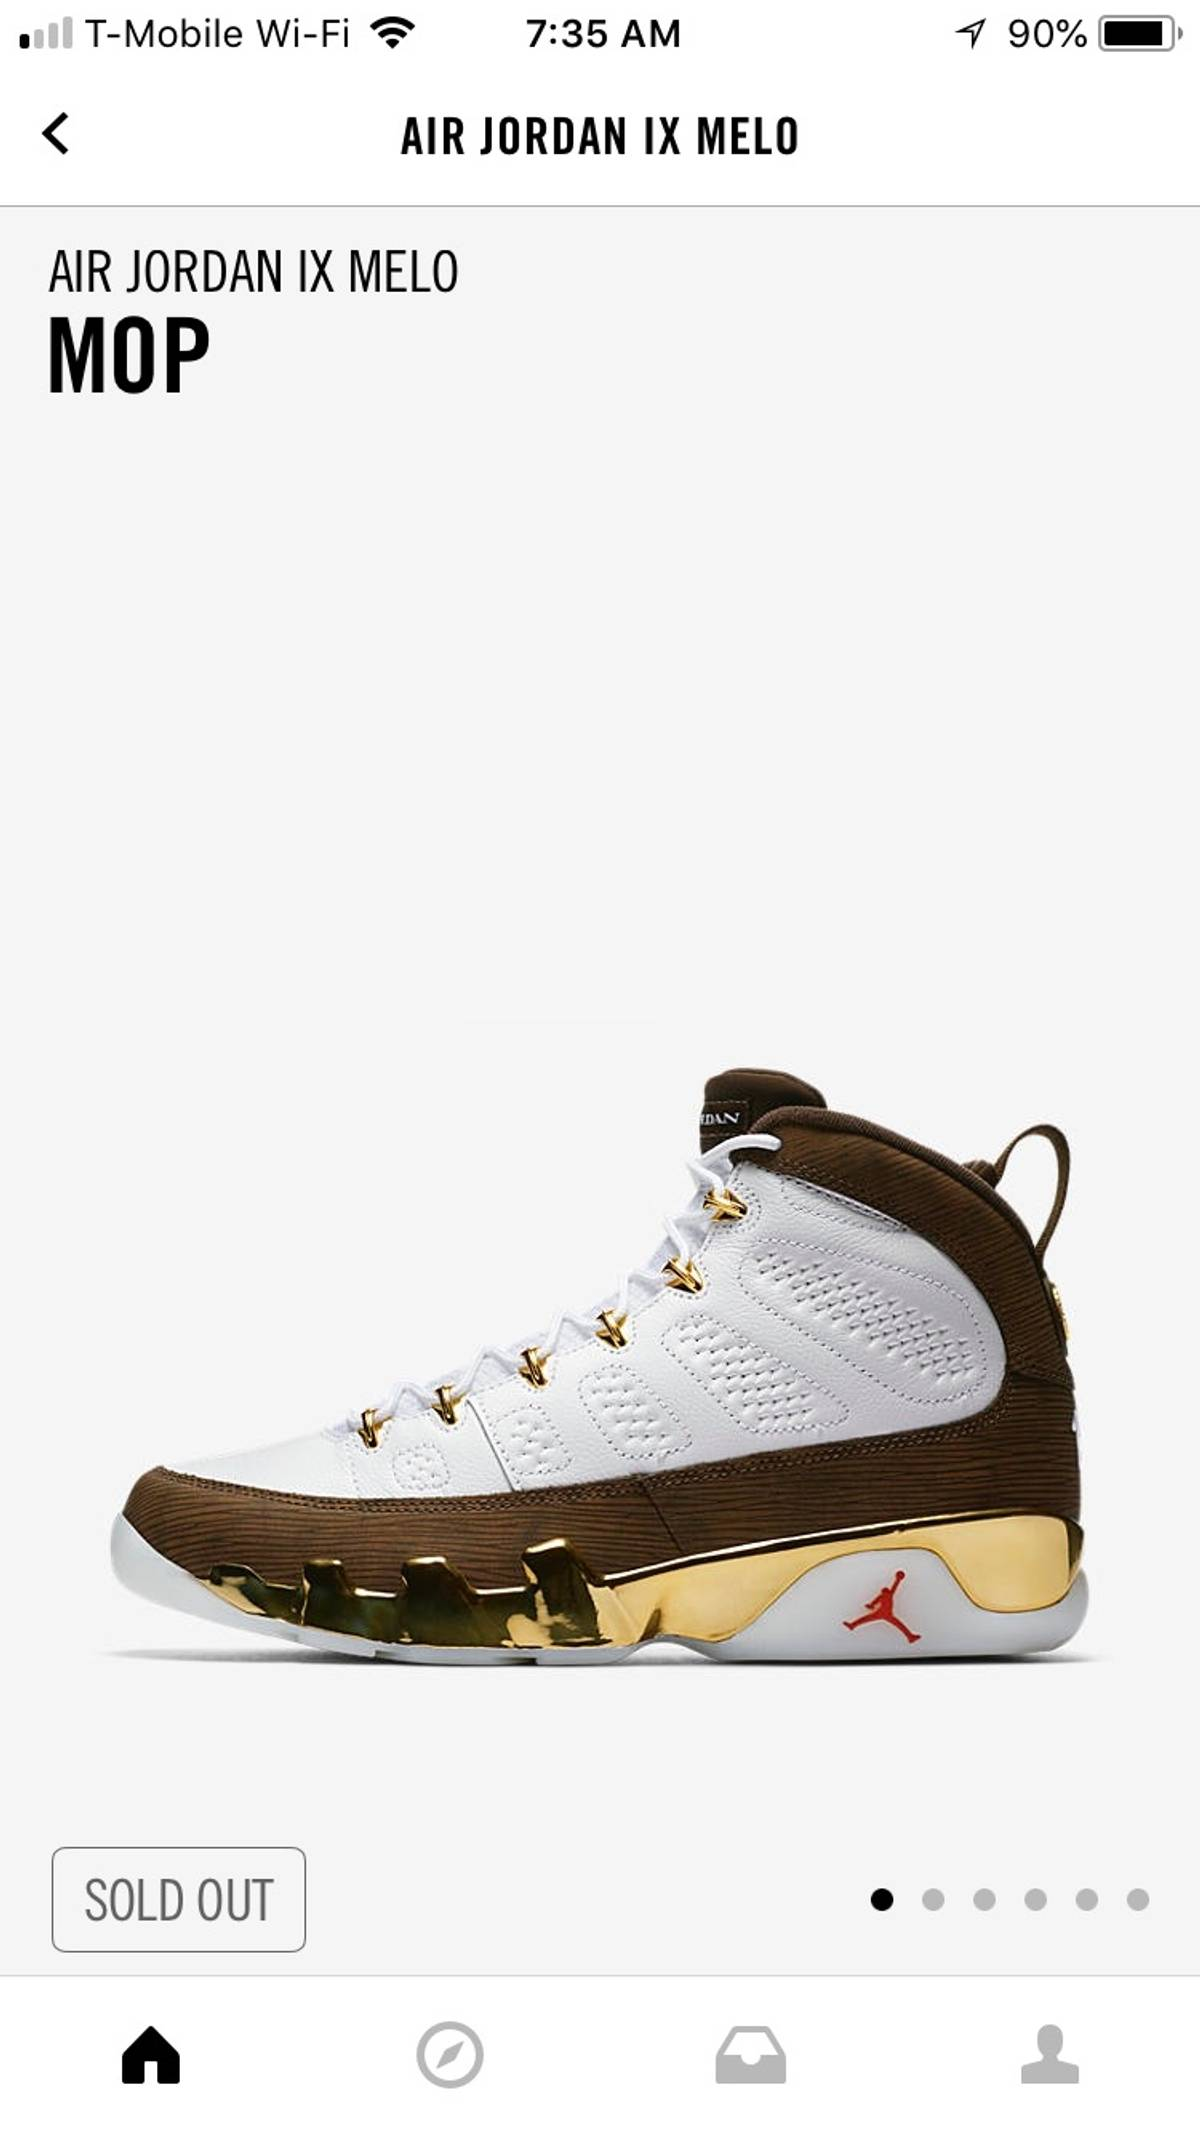 c8be08c6390 Jordan Brand ×. JORDAN IX MOP MELO. Size: US 9.5 / EU 42-43